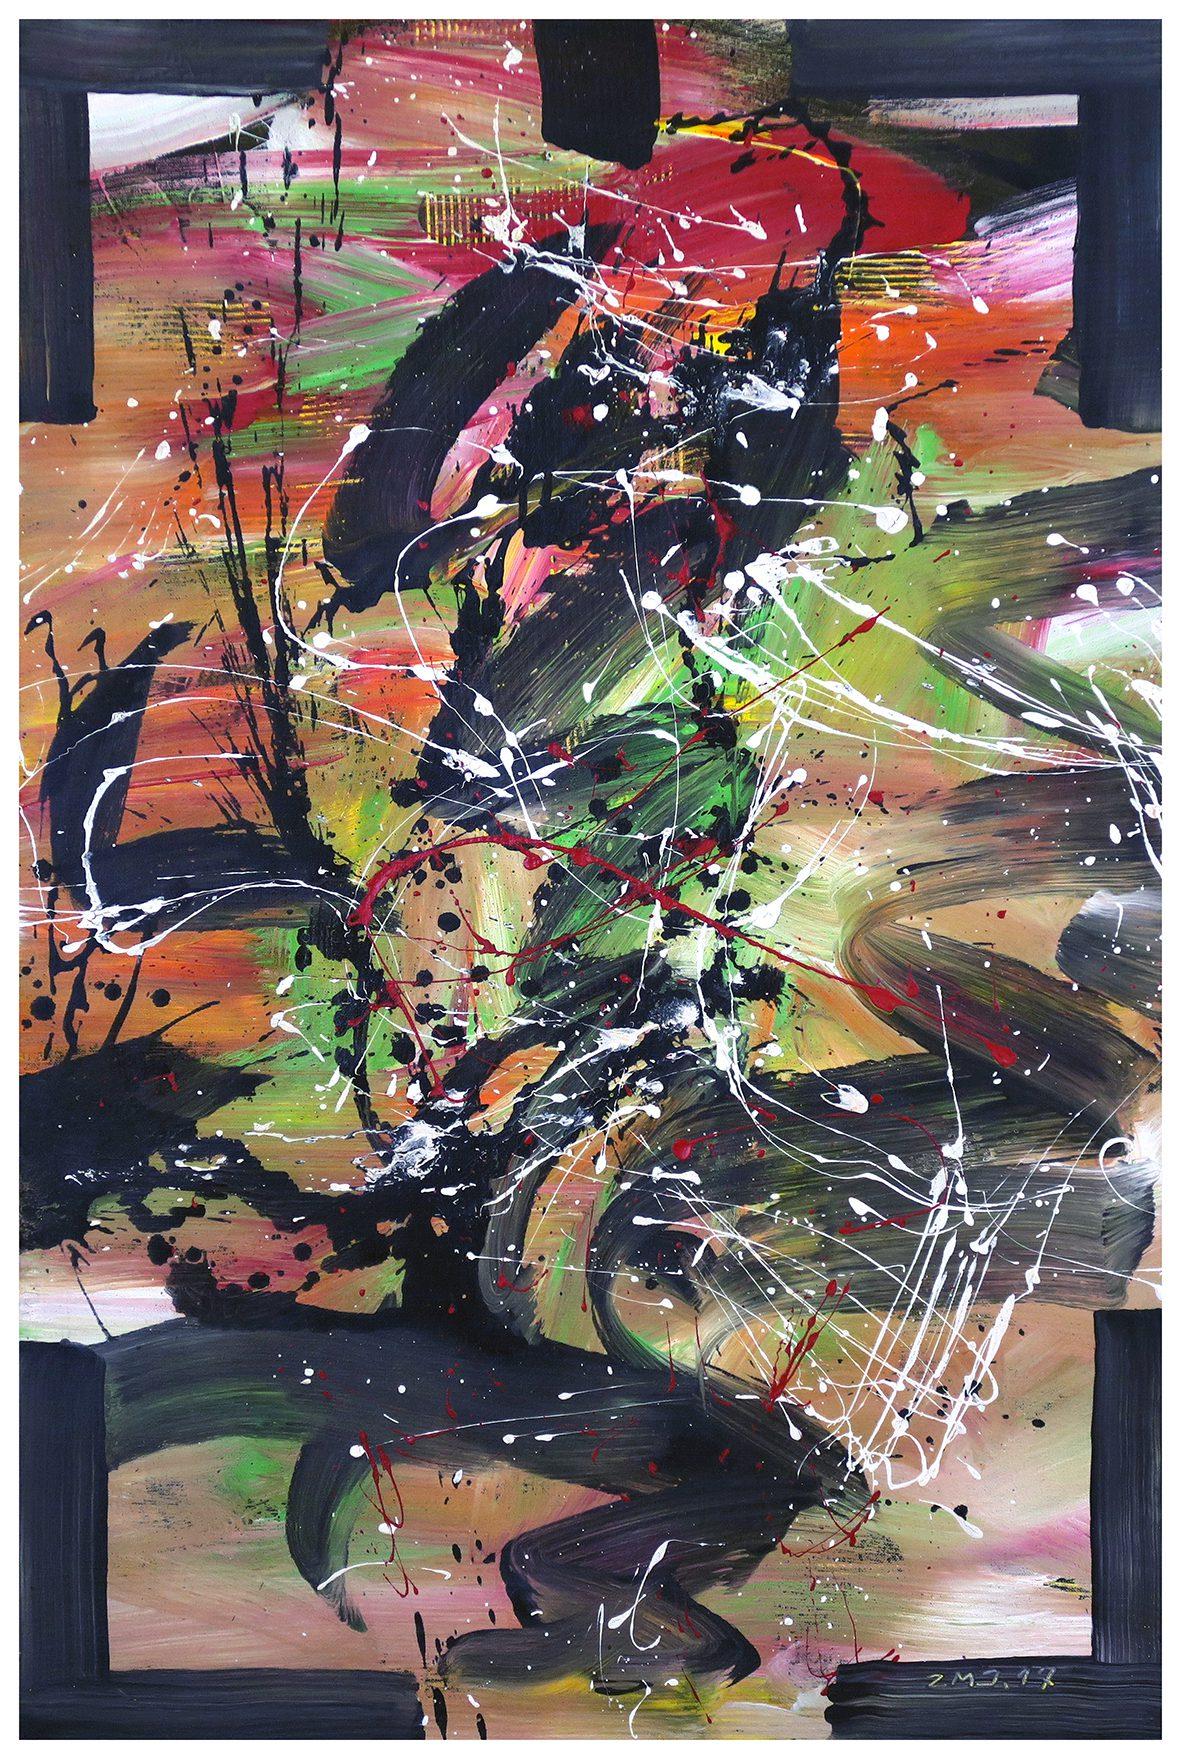 Zhao Mengjun Die Wildnis des Herzens 2017, Acrylic, propylene on canvas. 120 x 80 cm, framed.